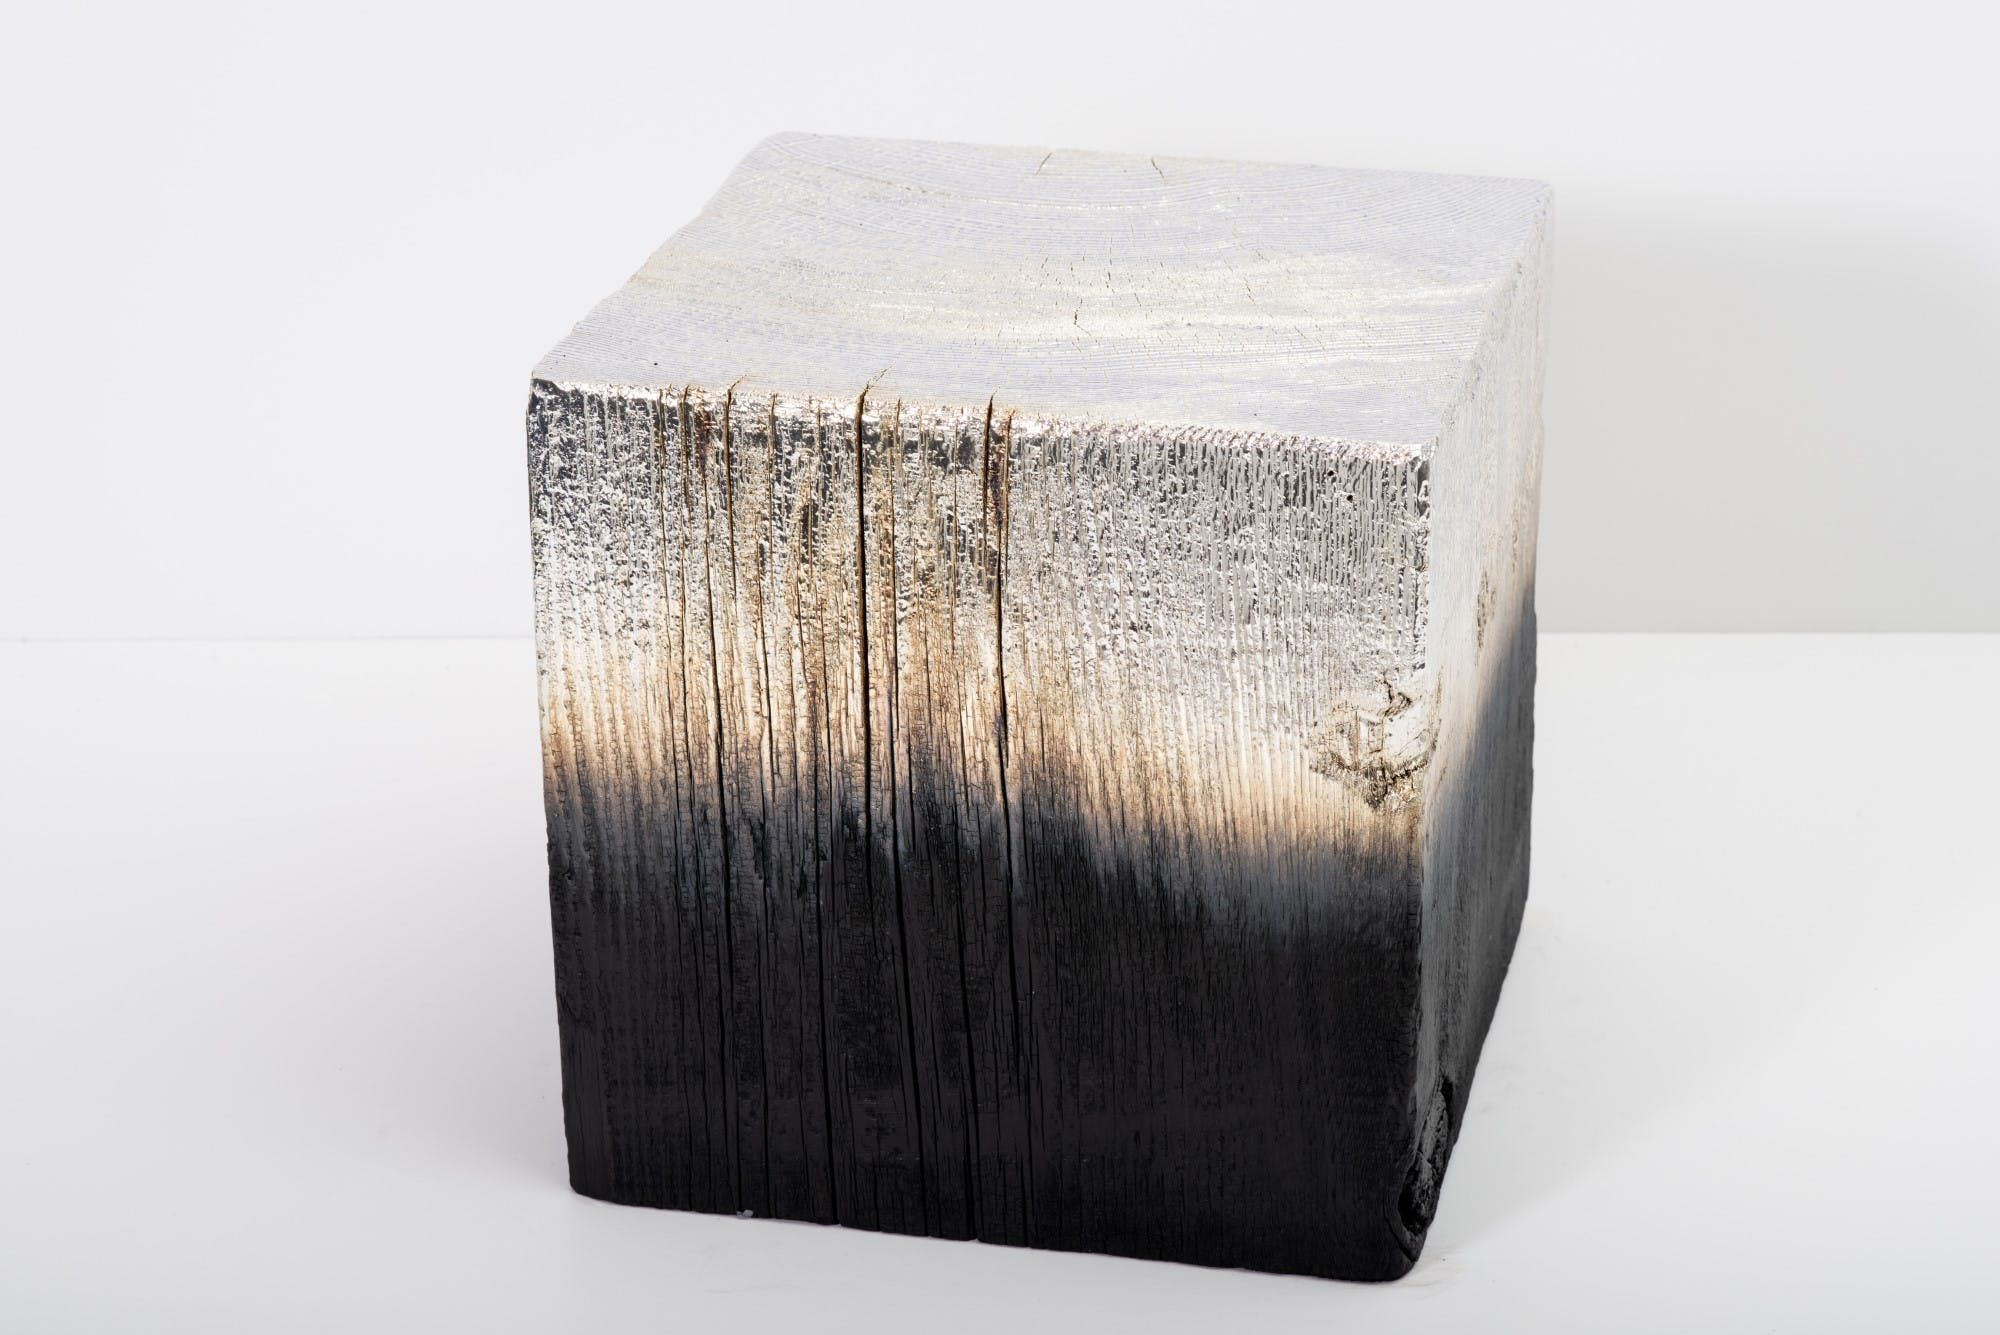 Alchemy (Shou Sugi Ban) Cube 3.19.12.8